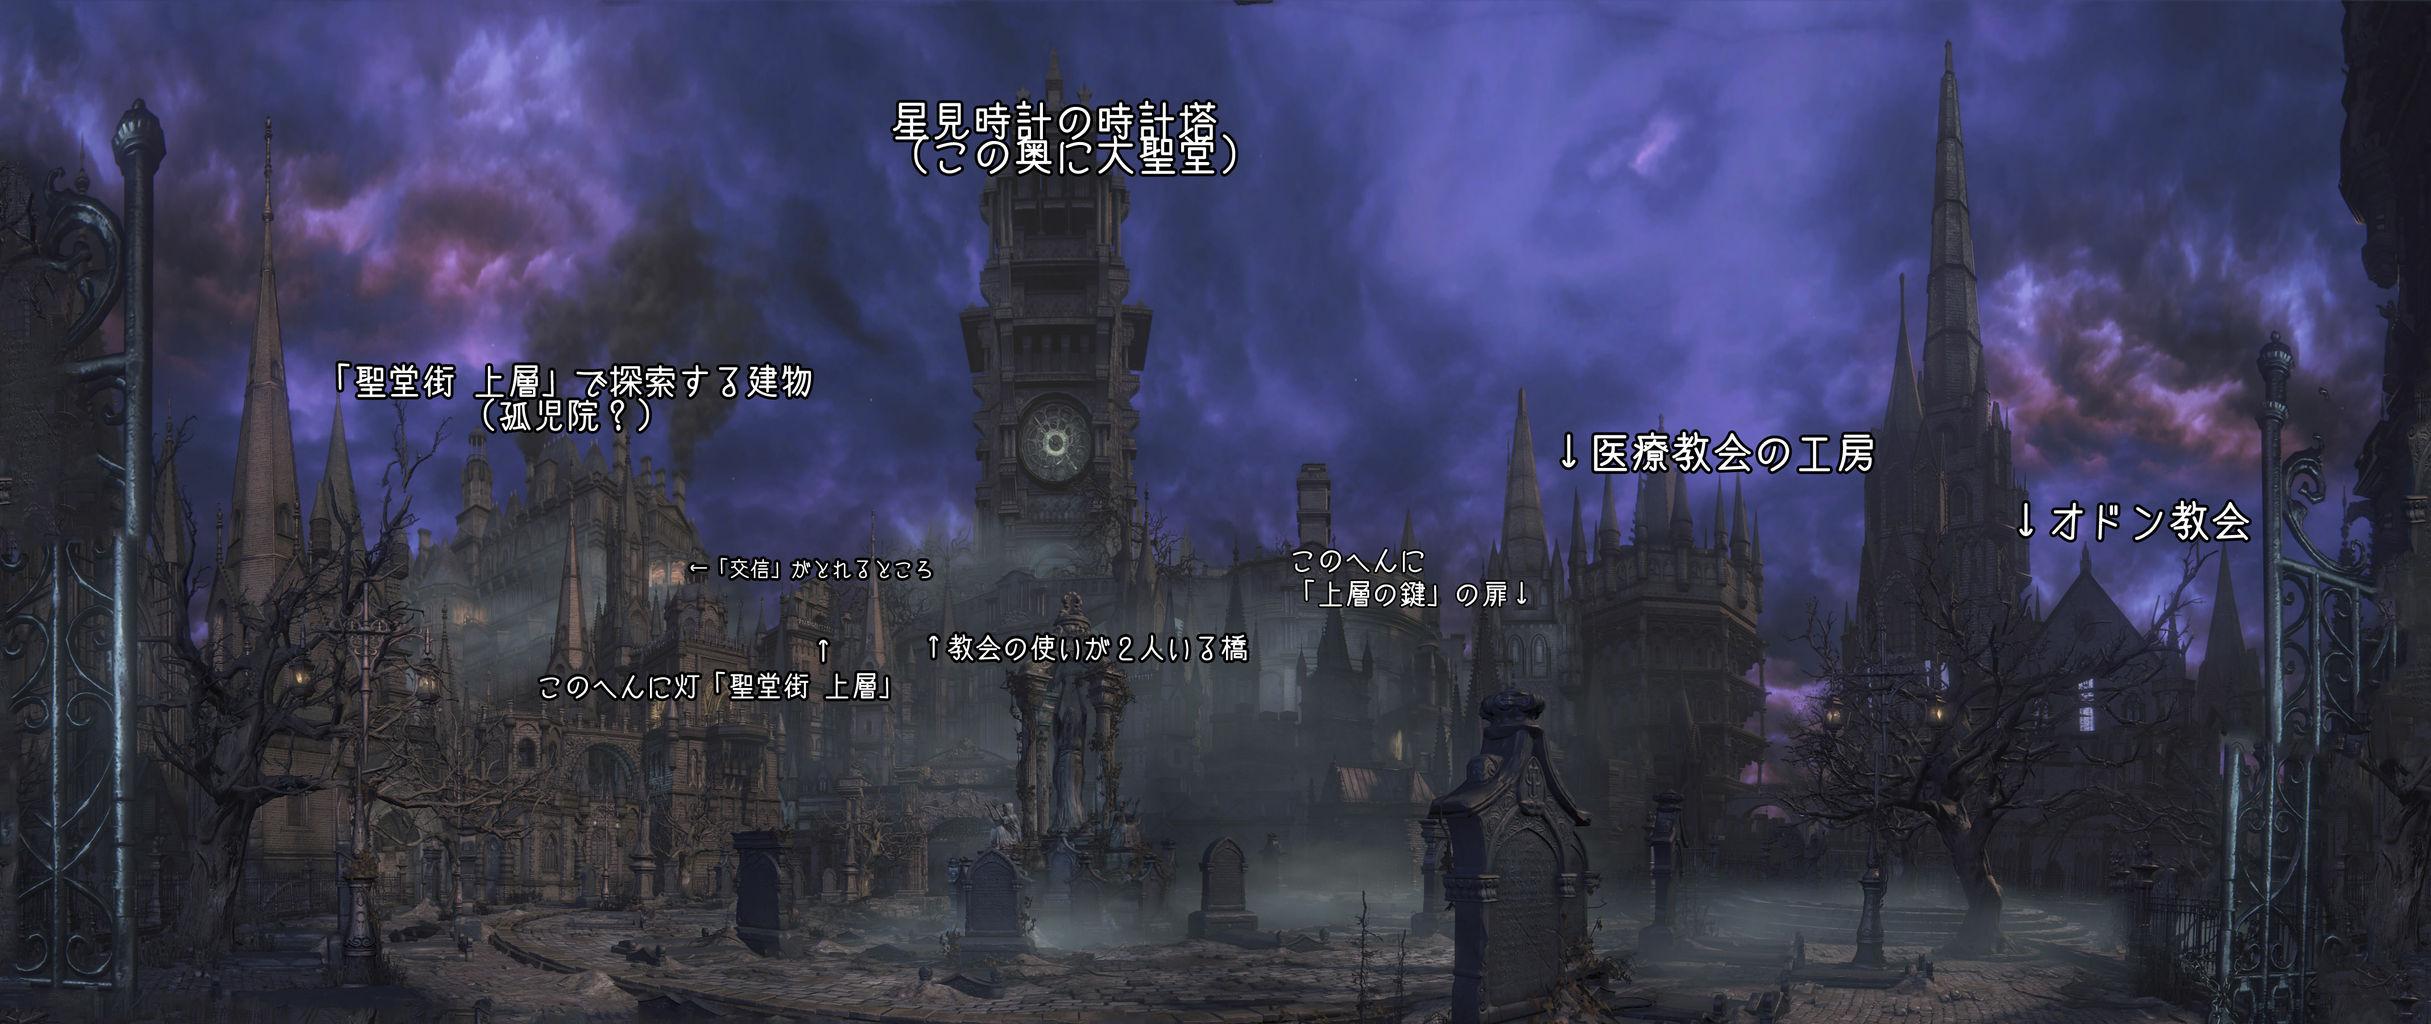 Amazon.co.jp: ぶたぶた【徳間文庫】: 矢崎存 ...